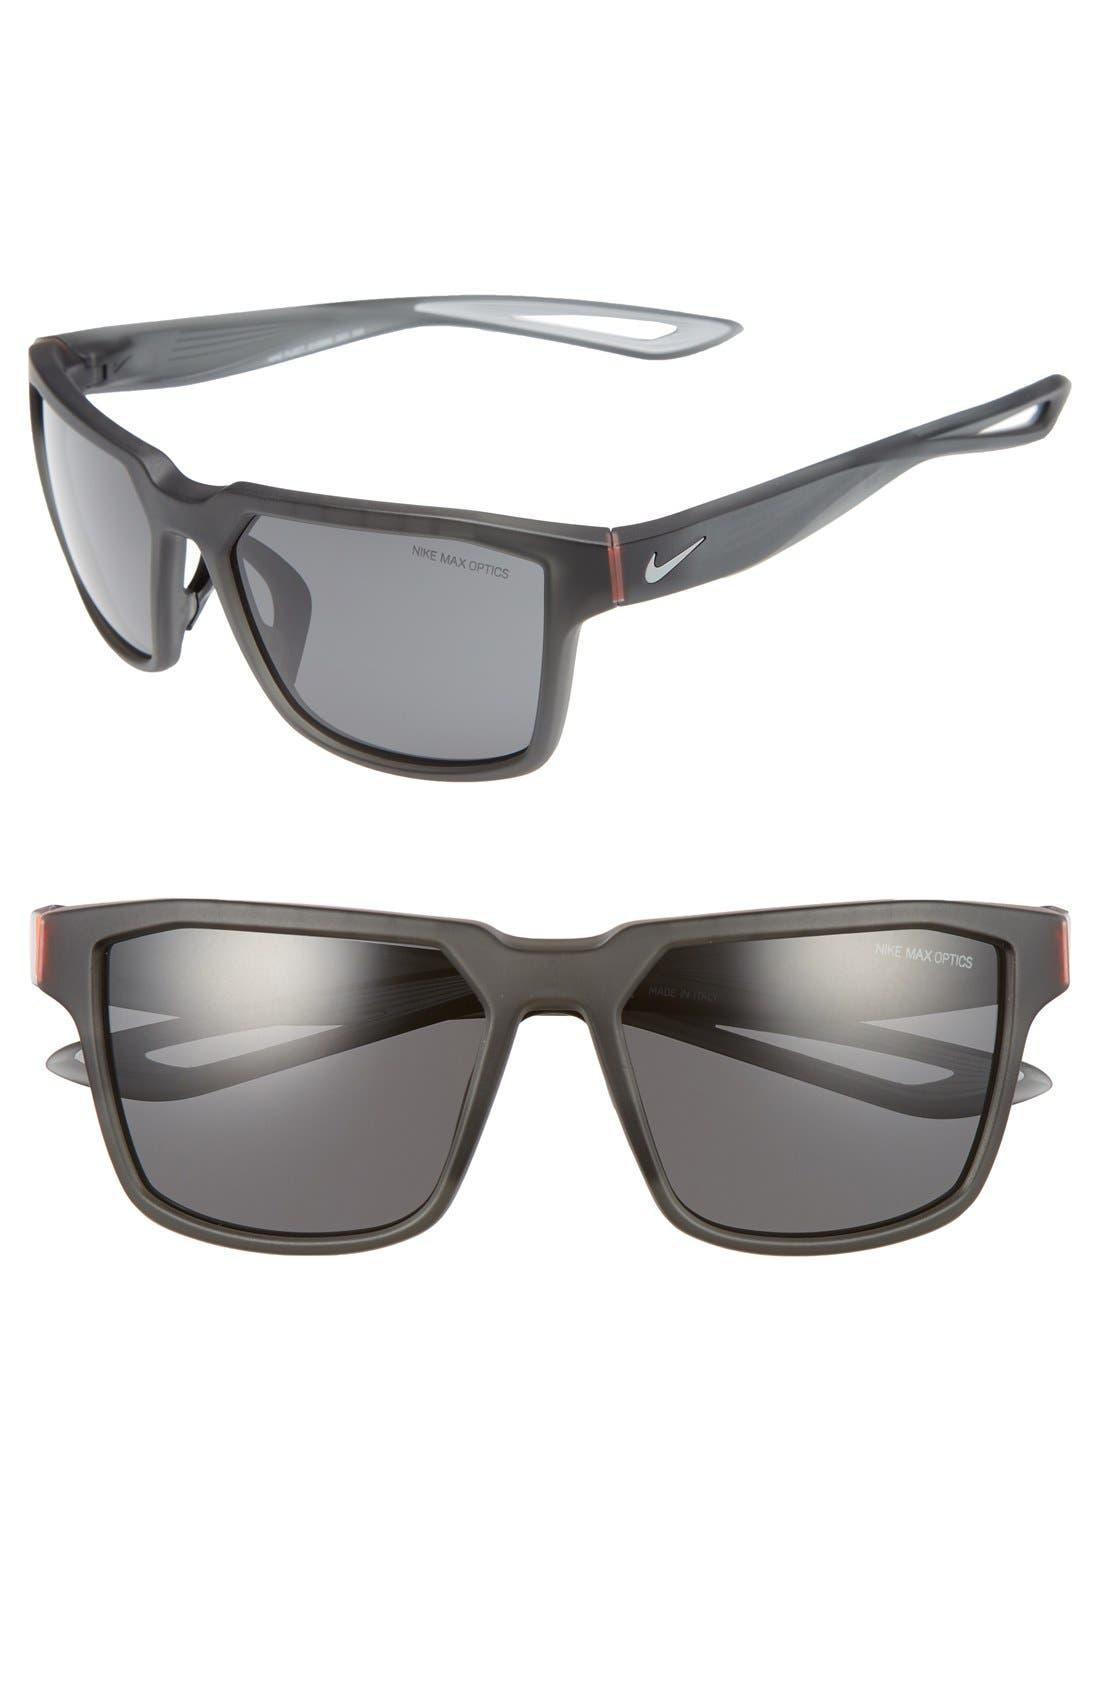 Fleet 55mm Sport Sunglasses,                             Main thumbnail 1, color,                             MATTE ANTHRACITE